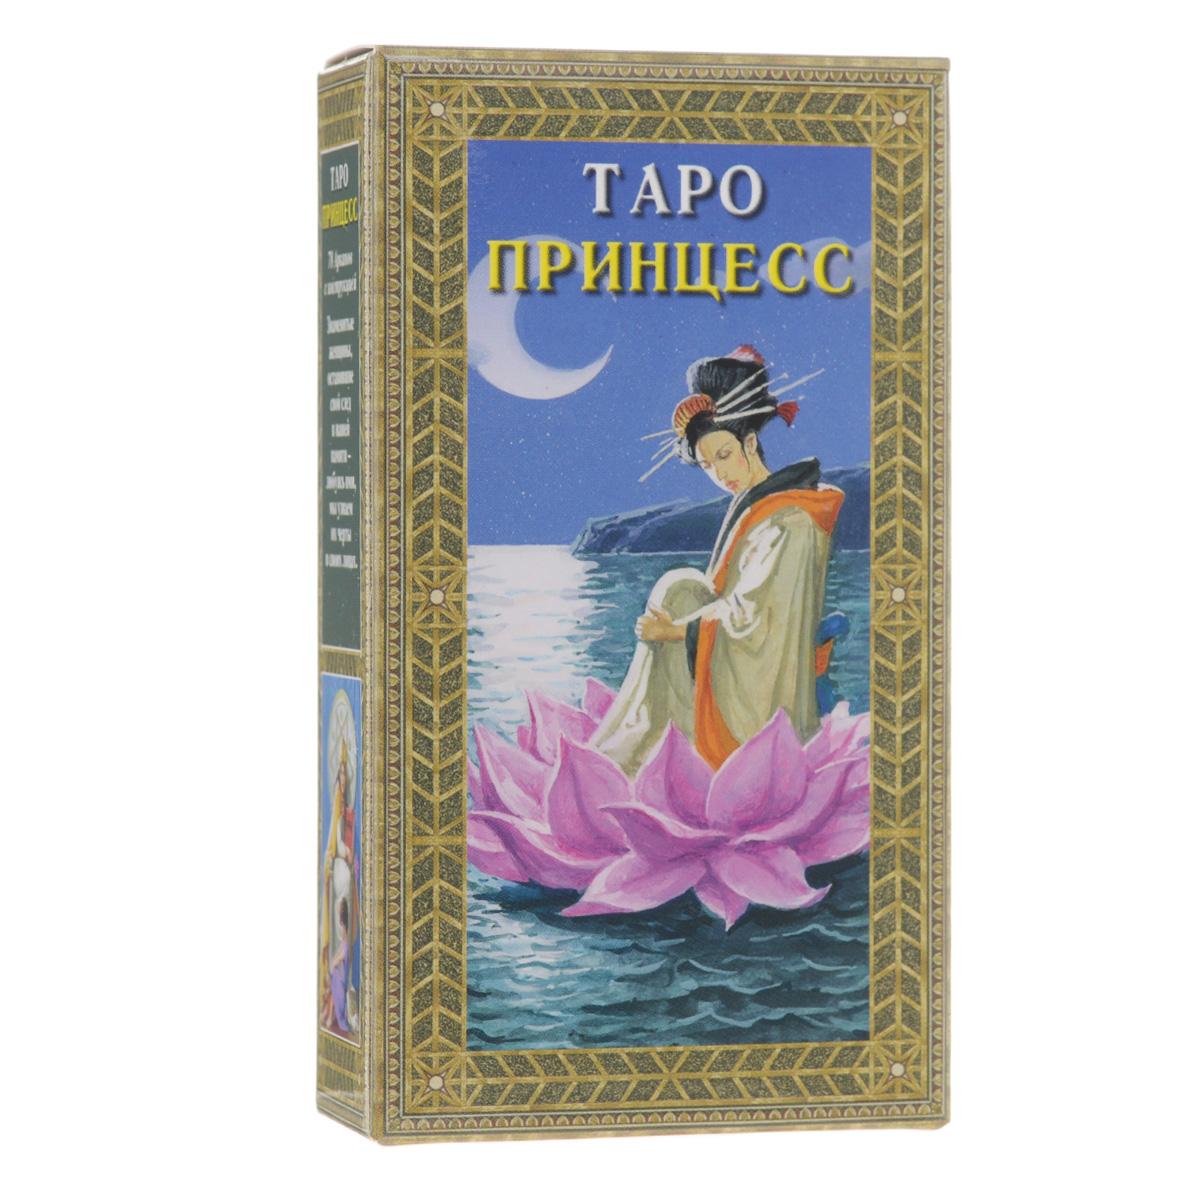 Карты Таро Аввалон-Ло скарабео Таро Принцесс, инструкция на русском языке. AV167